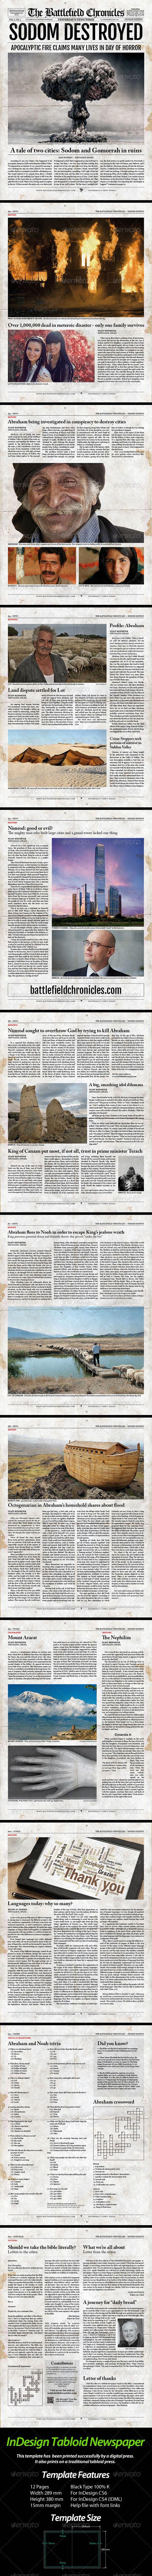 Tabloid Newspaper Template For Indesign Pinterest Newsletter